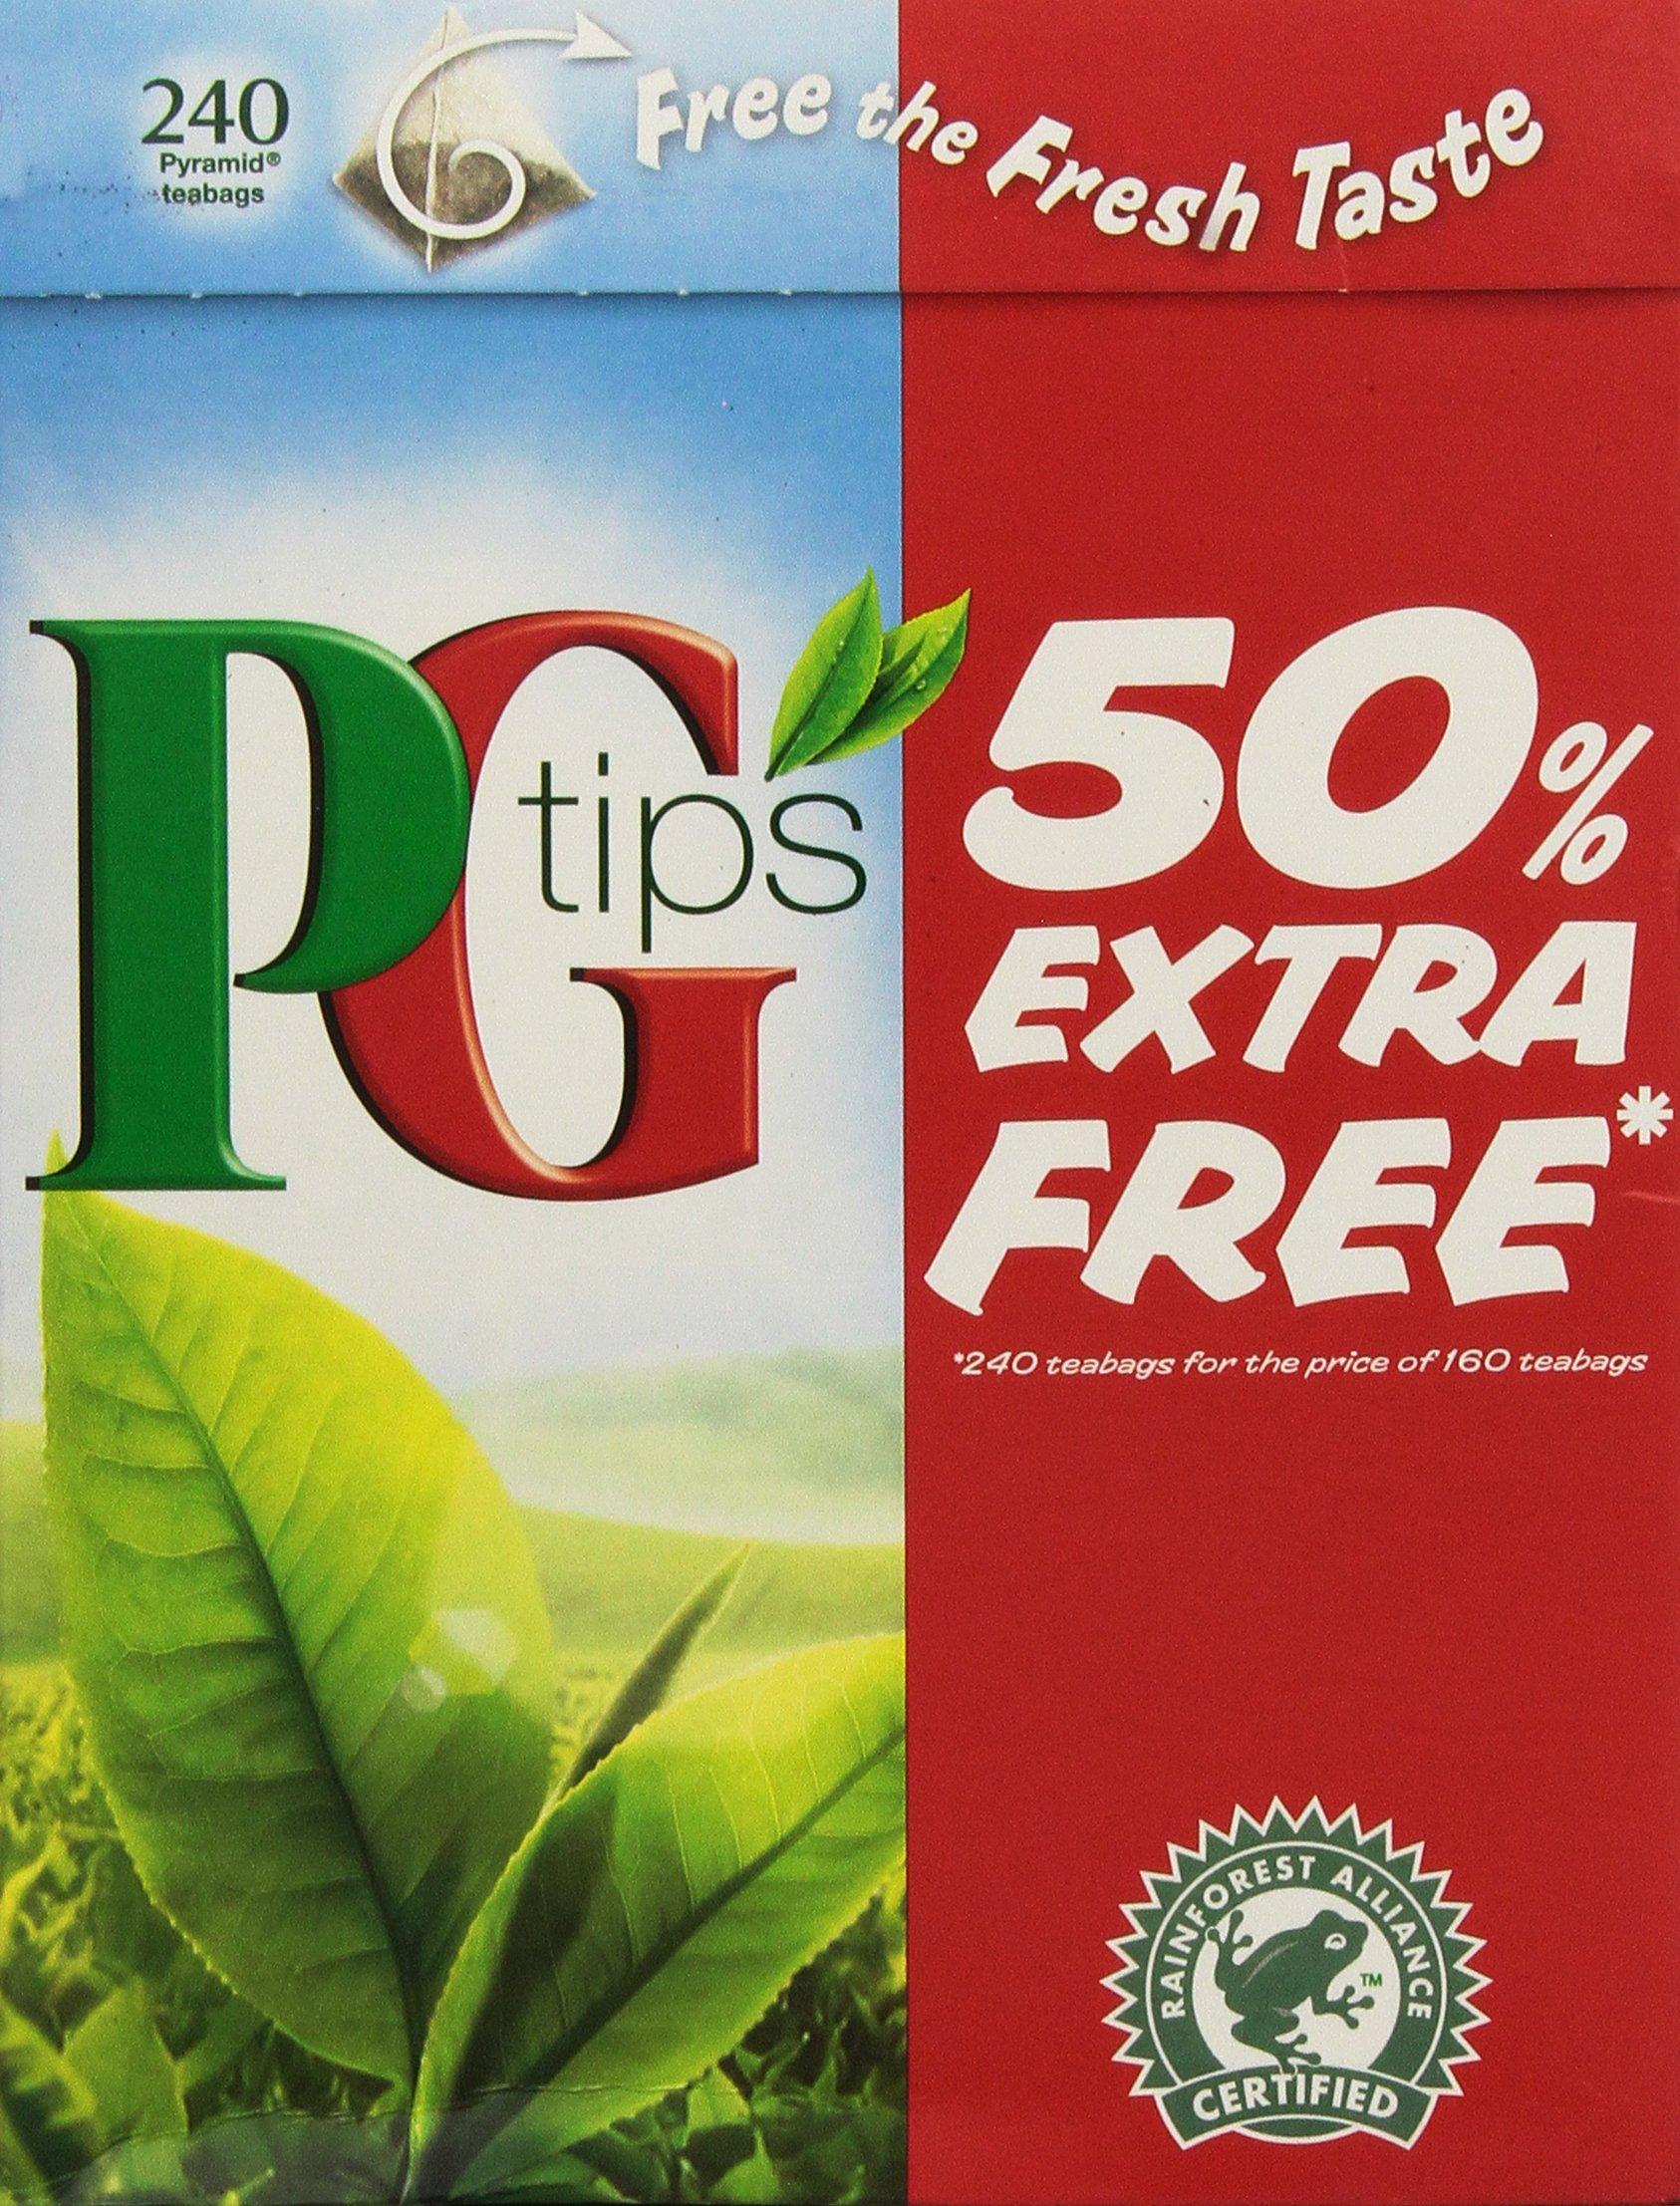 Pg Tips 240 Bags 2pk (160 Bags +80 Bags Free)- 480 teabags total.